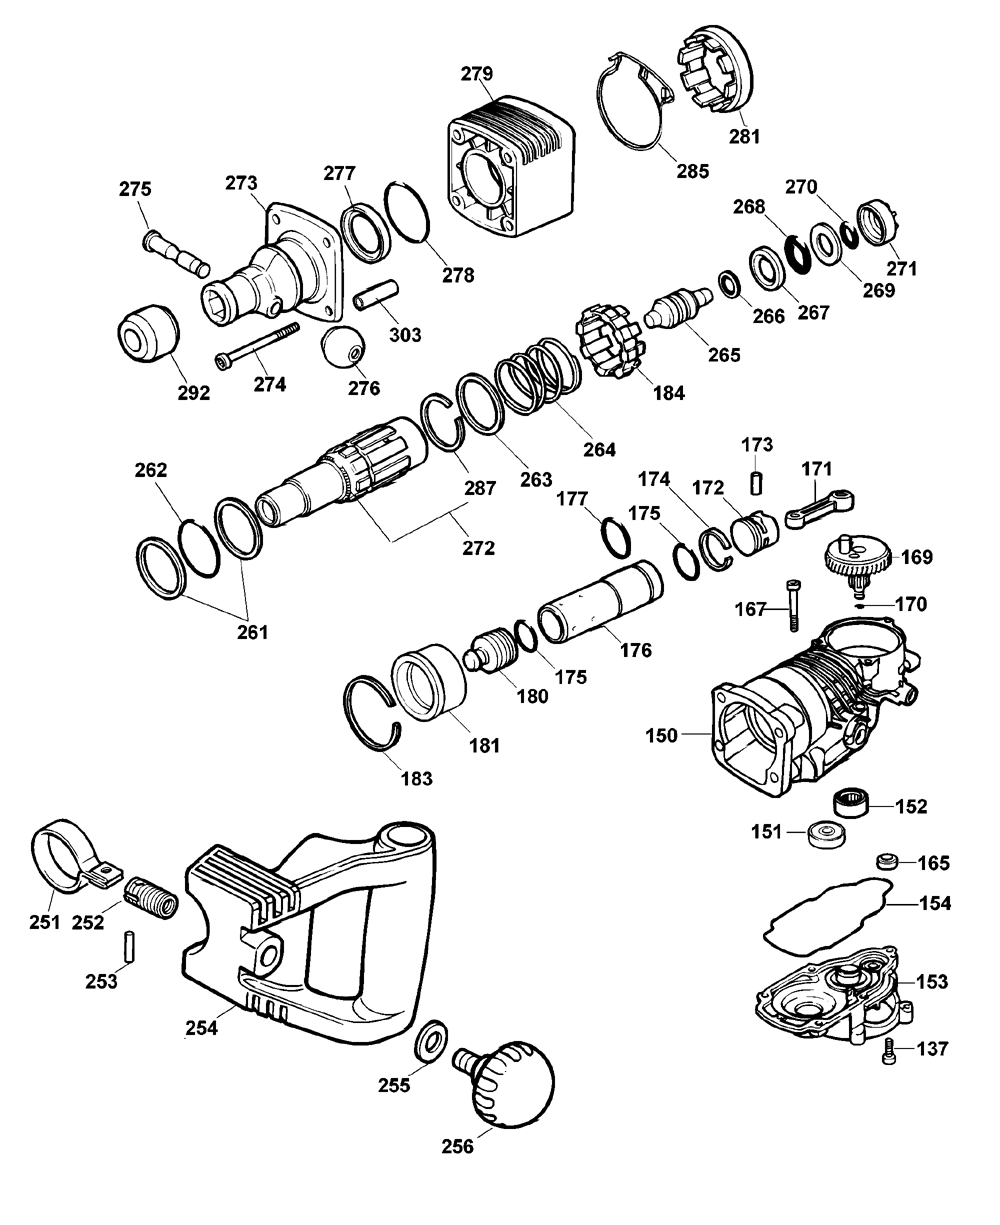 D25850K-T2-Dewalt-PB-1Break Down